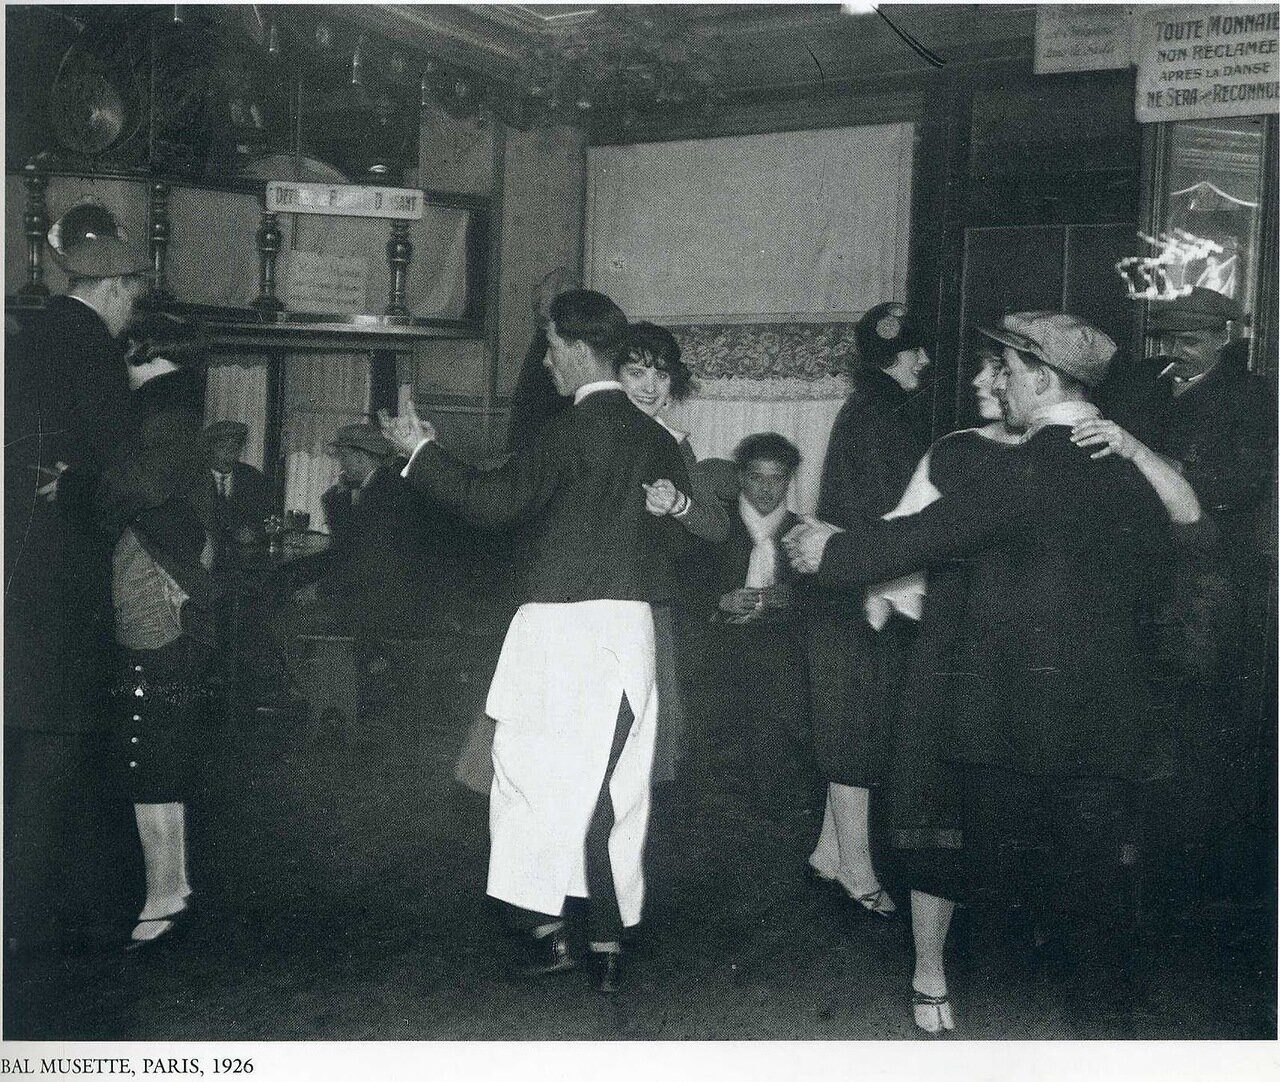 Танцпол. Париж, 1926